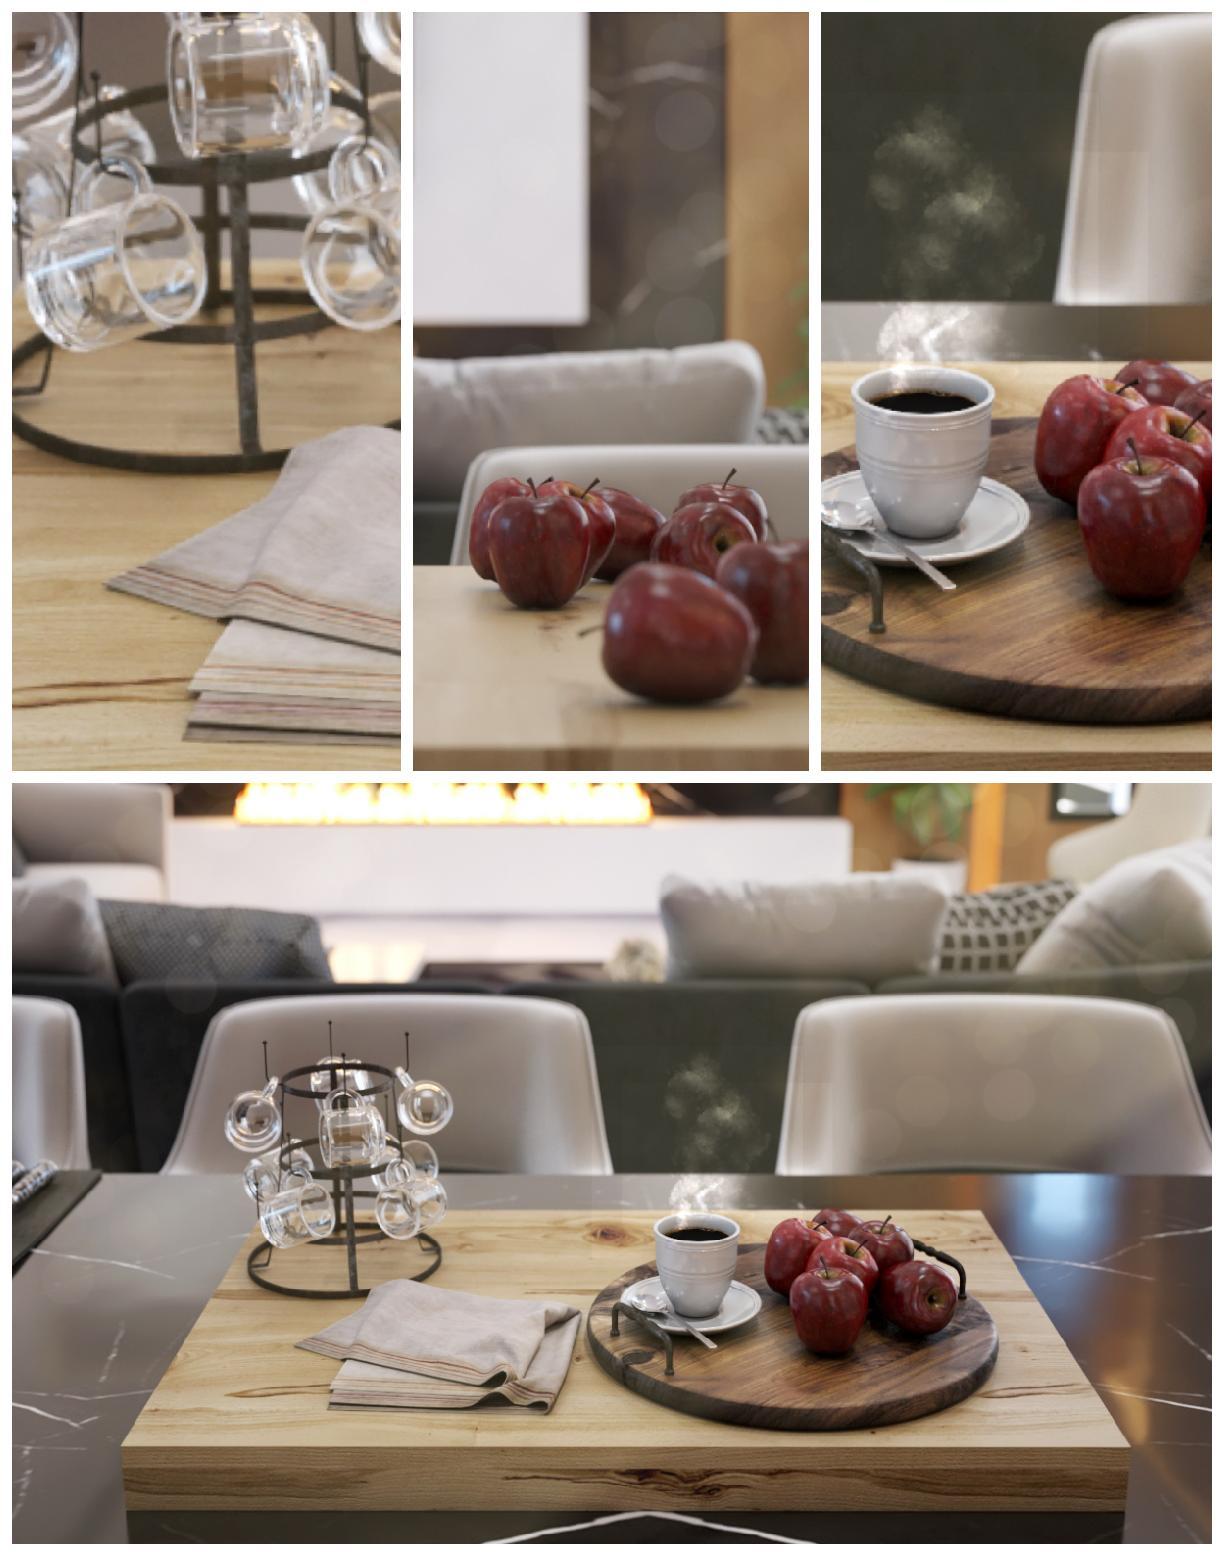 Tarekbo coffee and apple 1 ef8f07e2 2rrh